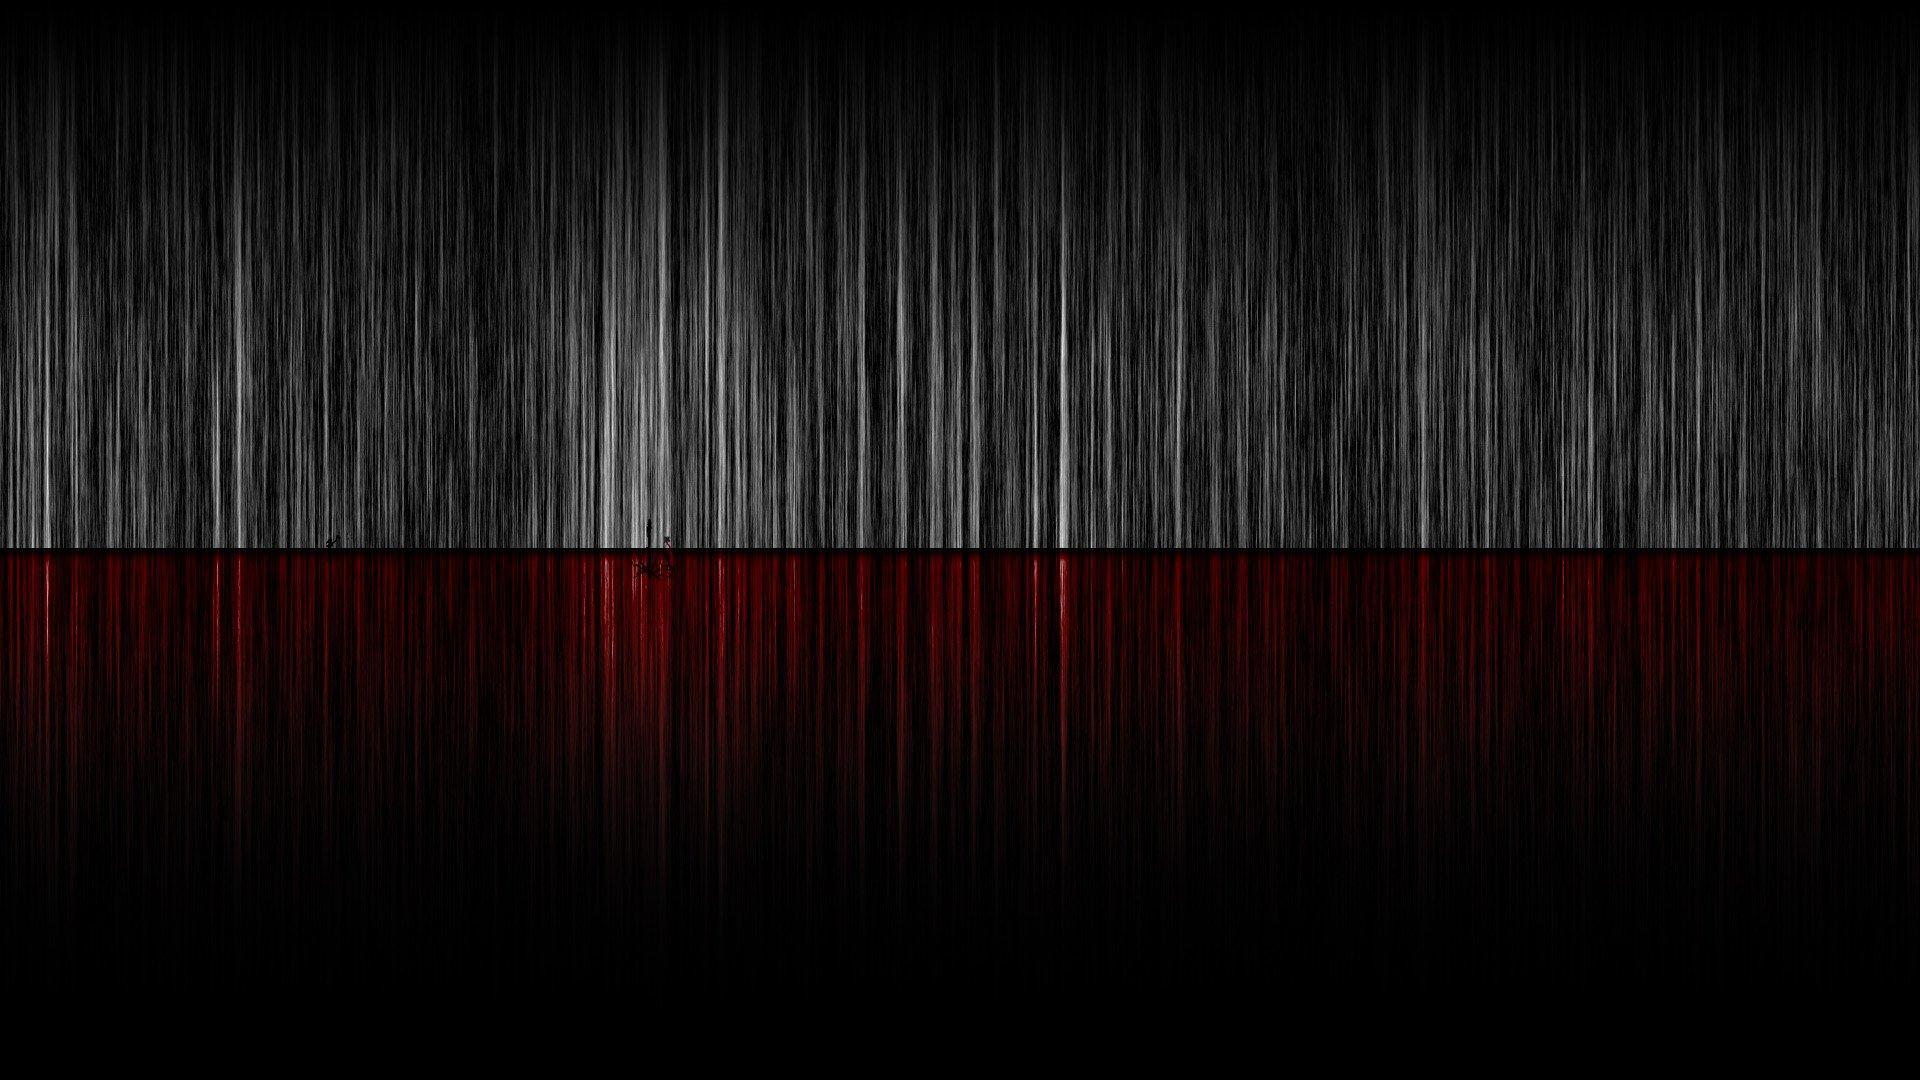 black background wallpaper hd